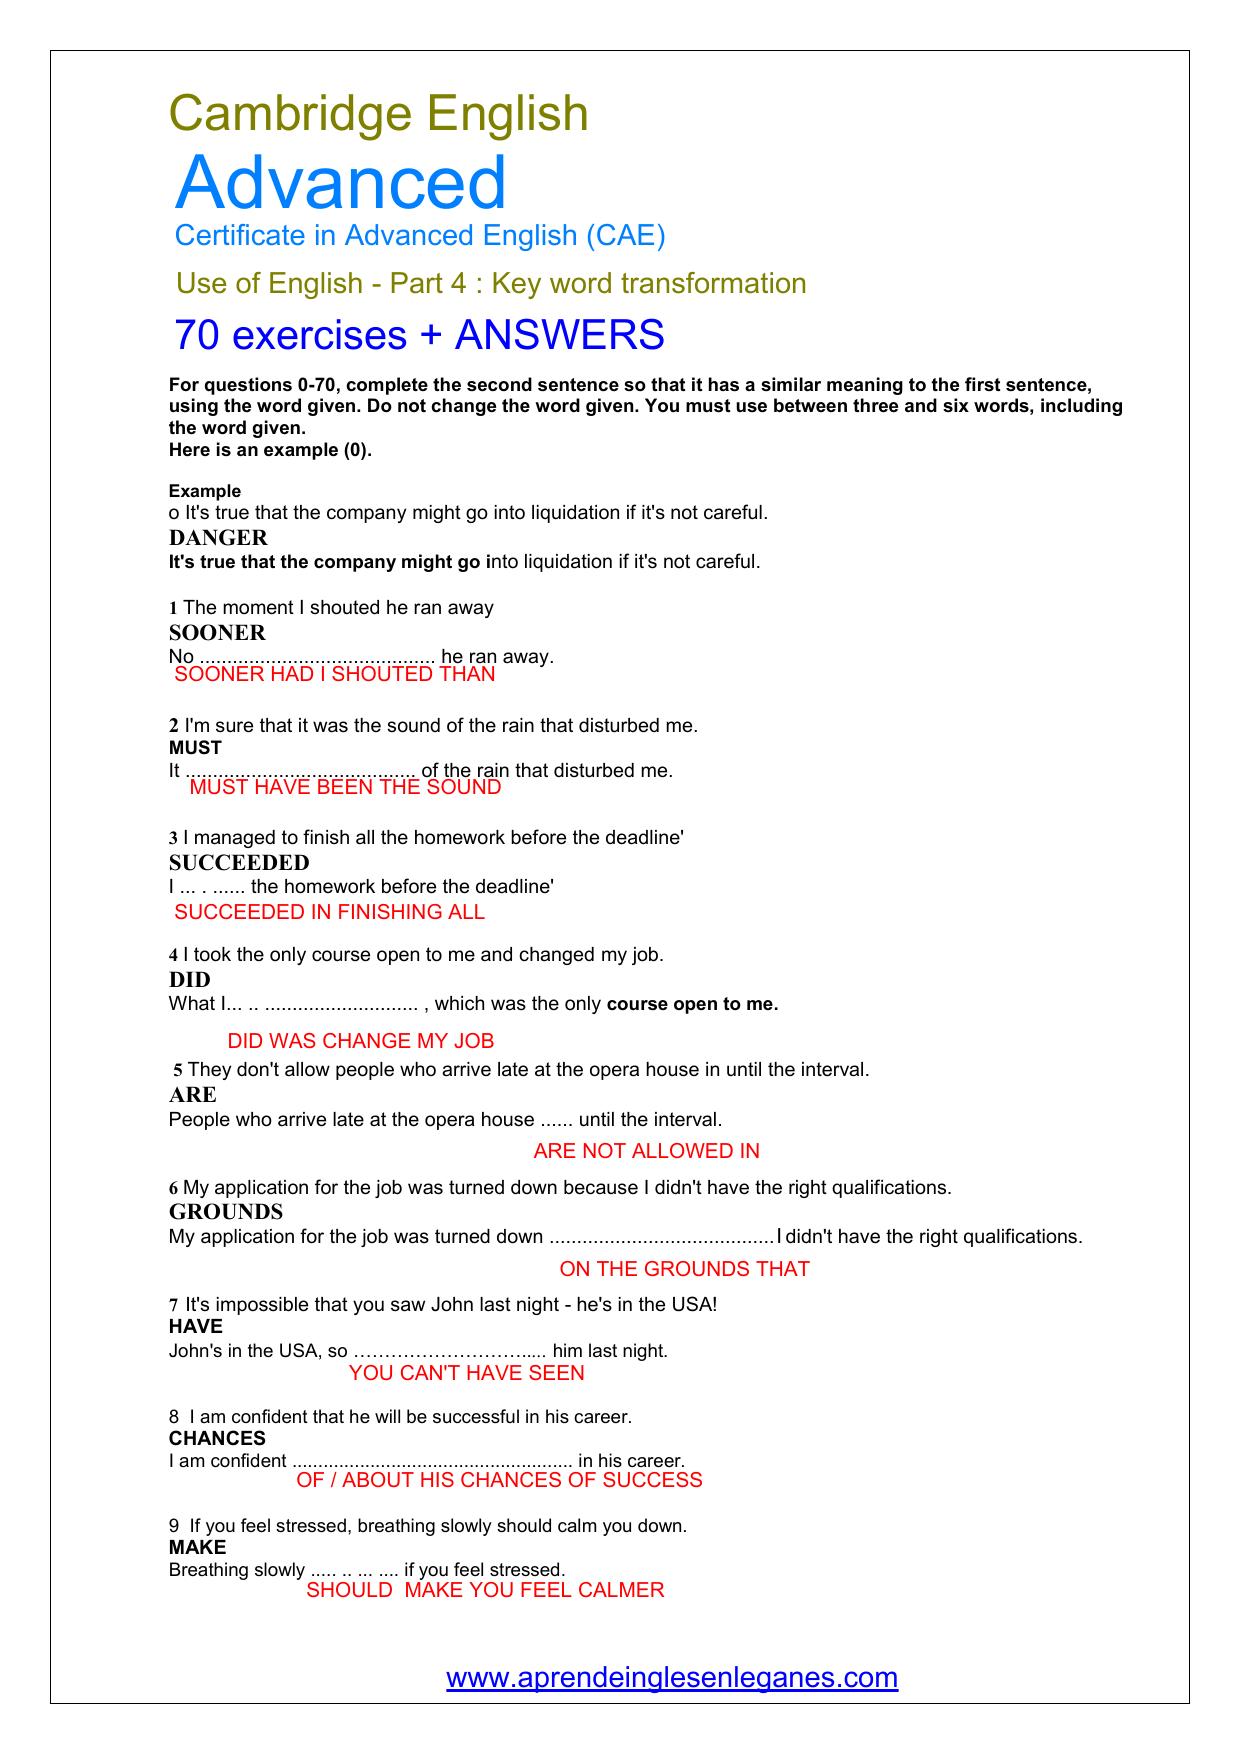 70 CAE KEY WORD TRANSFORMATIONS + ANSWERS